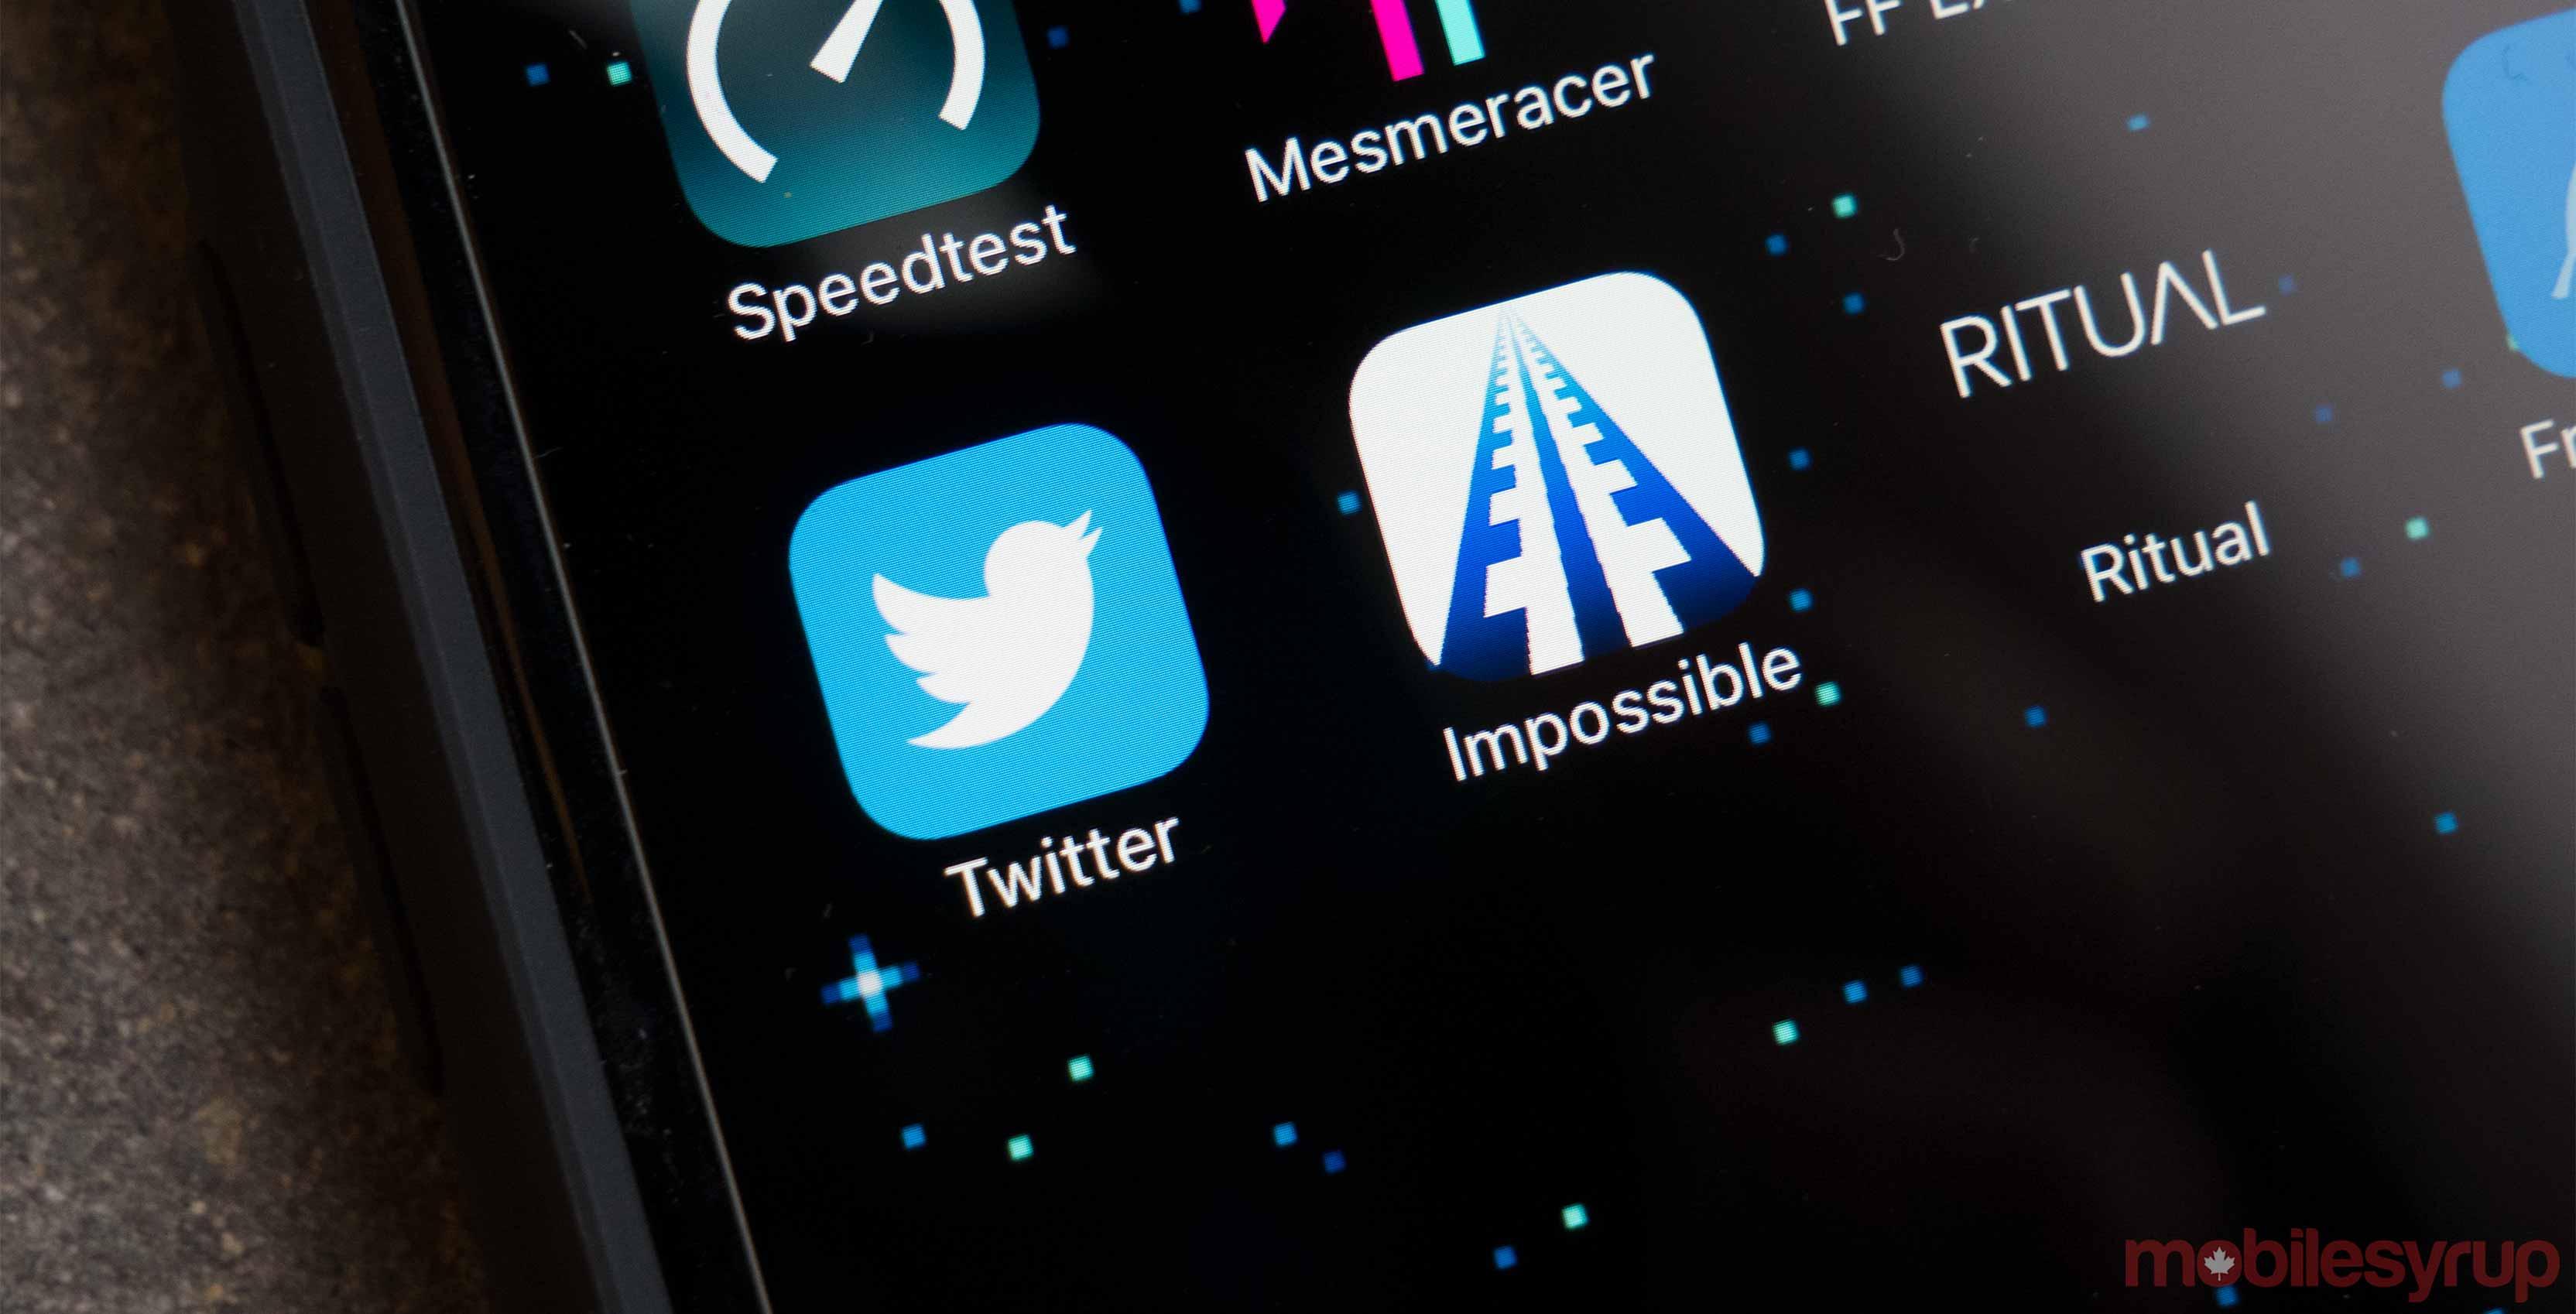 Twitter app on phone